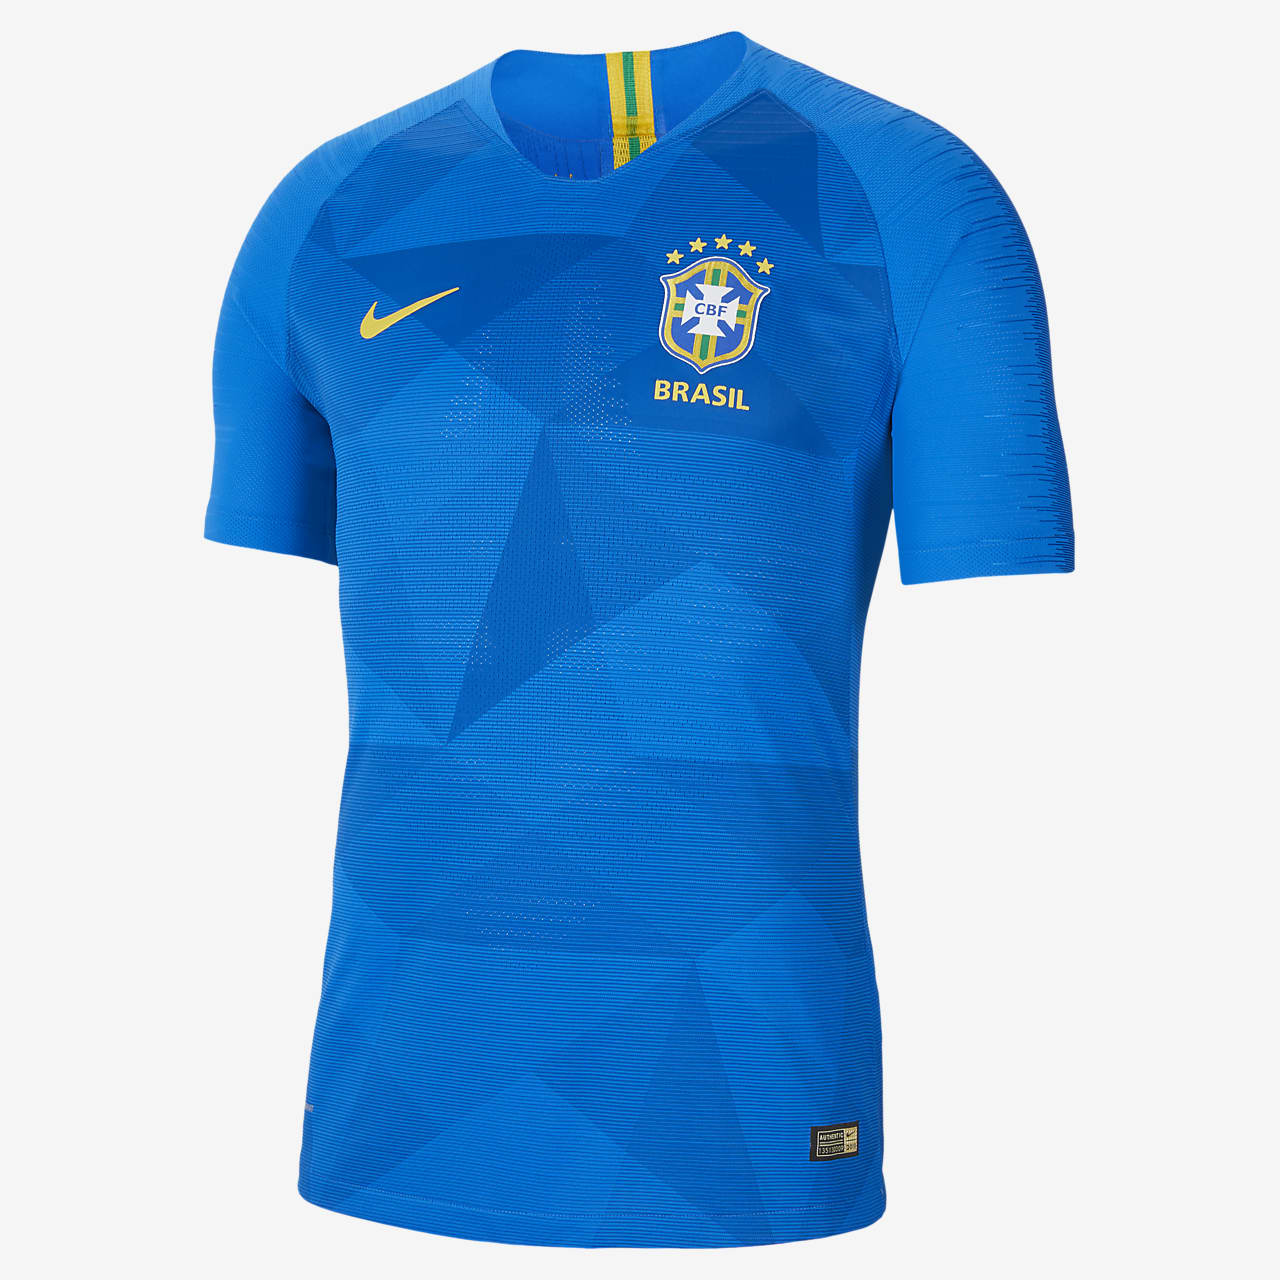 Camiseta de fútbol para hombre 2018 Brasil CBF Vapor Match Away